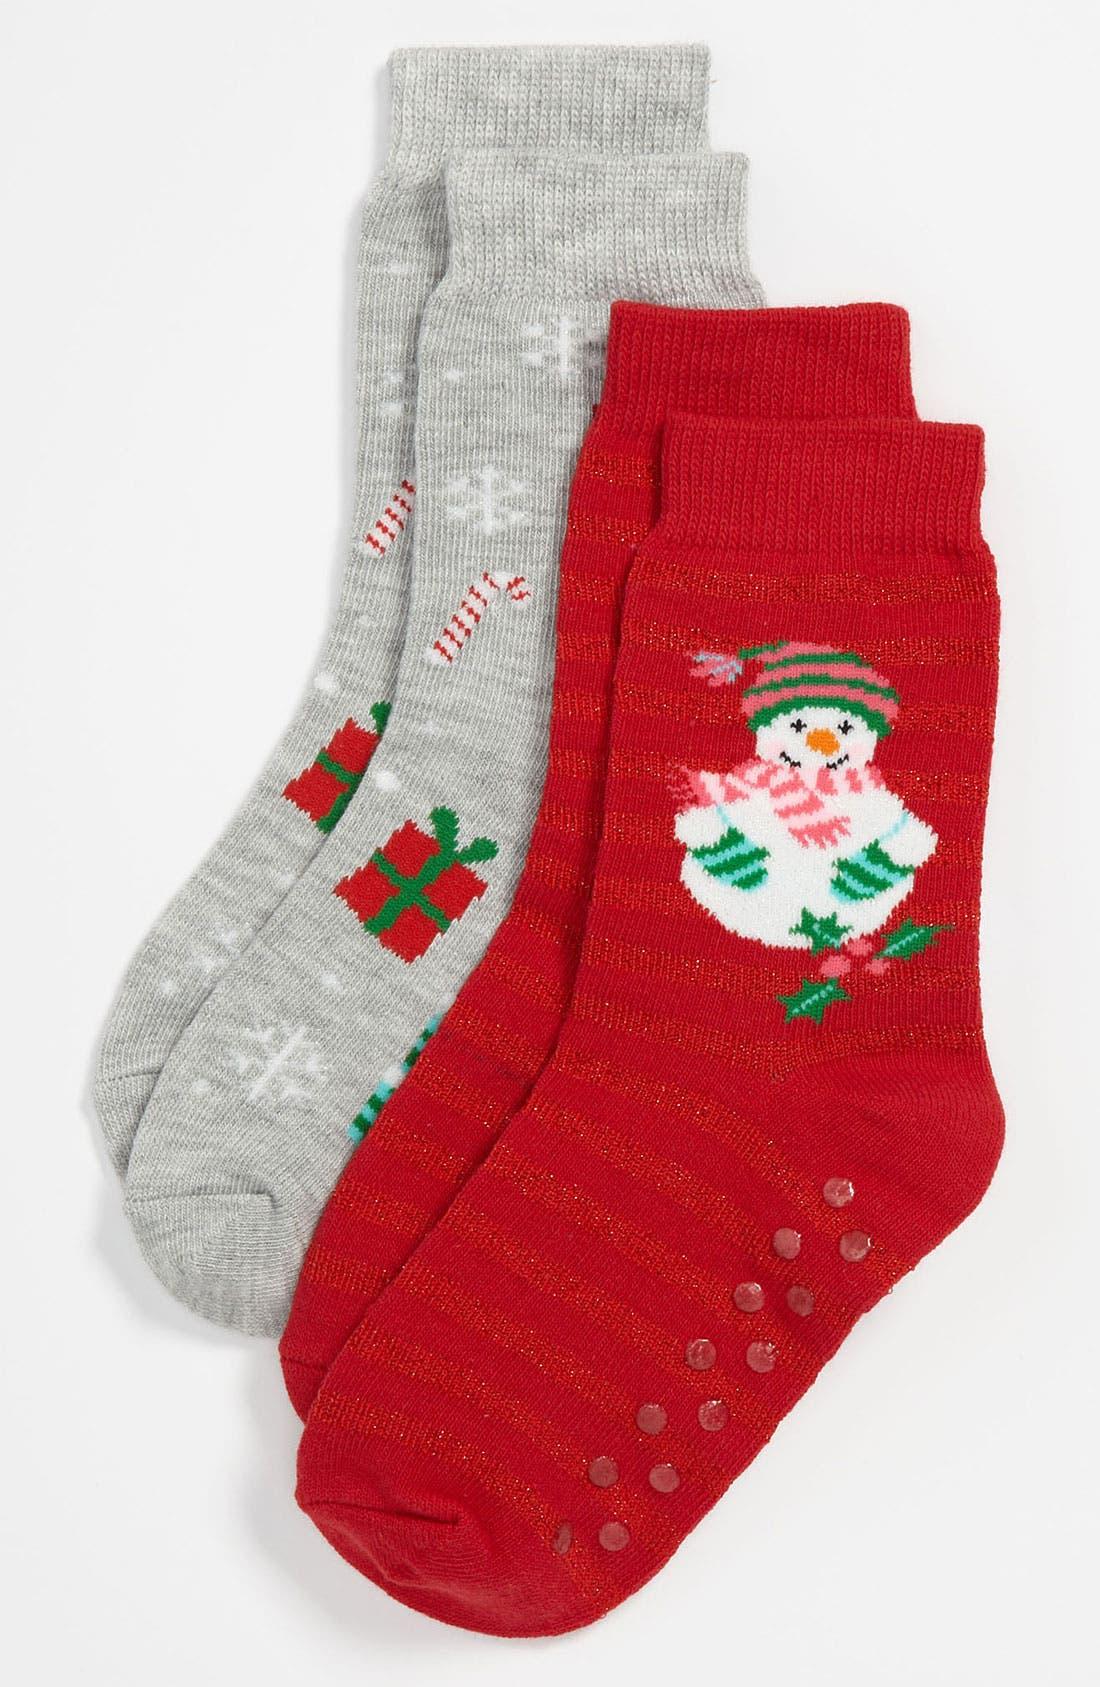 Alternate Image 1 Selected - Nordstrom 'Snowman' Socks (2-Pack) (Walker, Toddler, Little Kid & Big Kid)